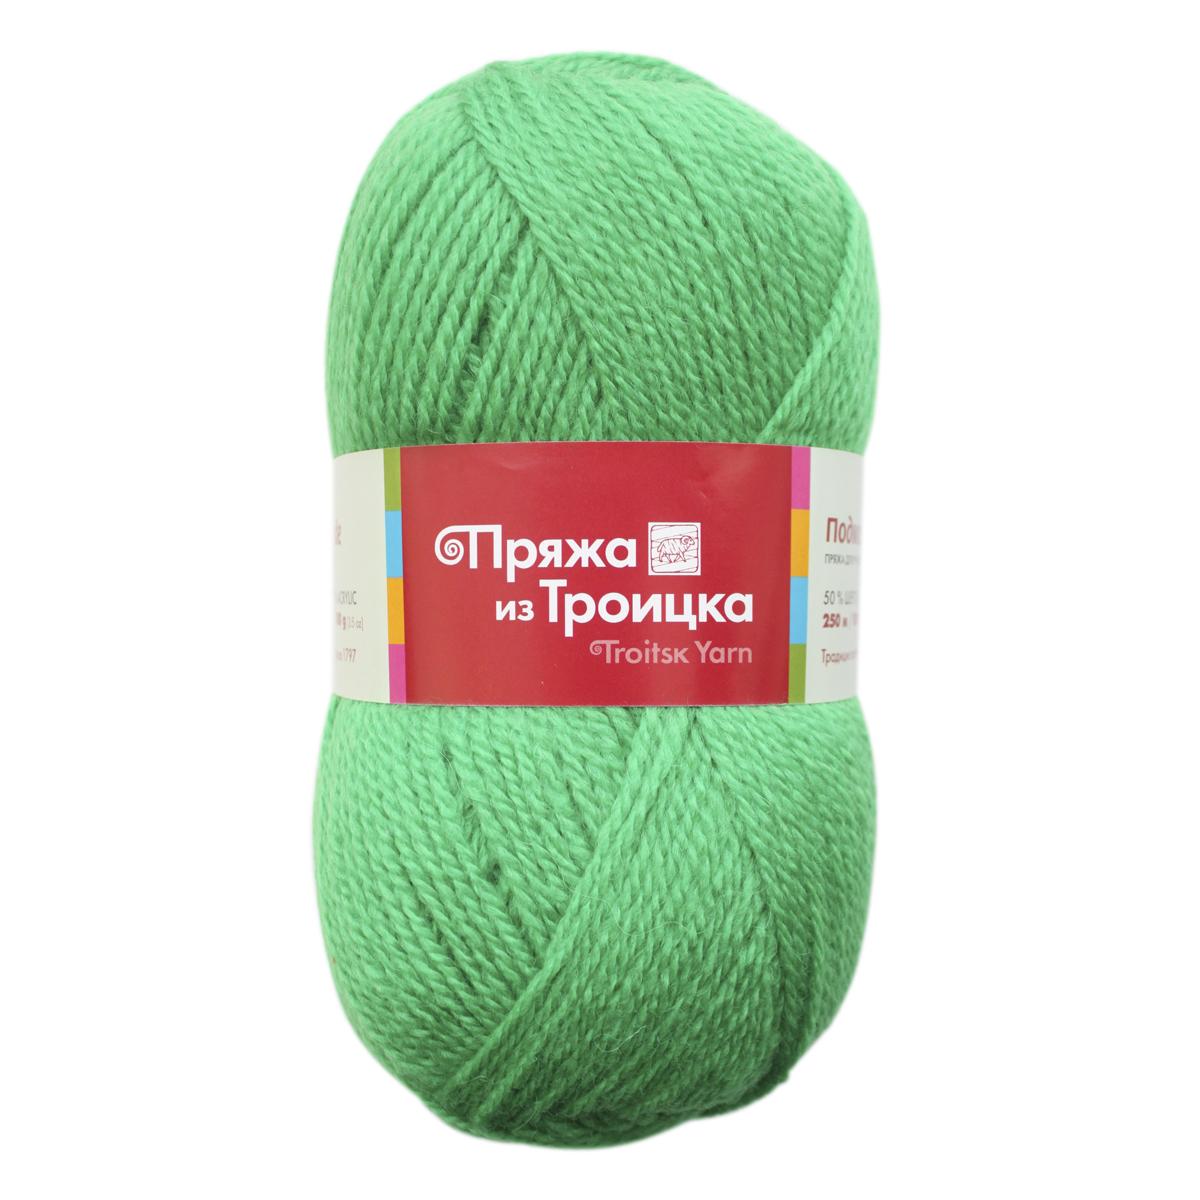 Пряжа для вязания Подмосковная, 100 г, 250 м, цвет: 0723 ярко-зеленый, 10 шт366001_0723